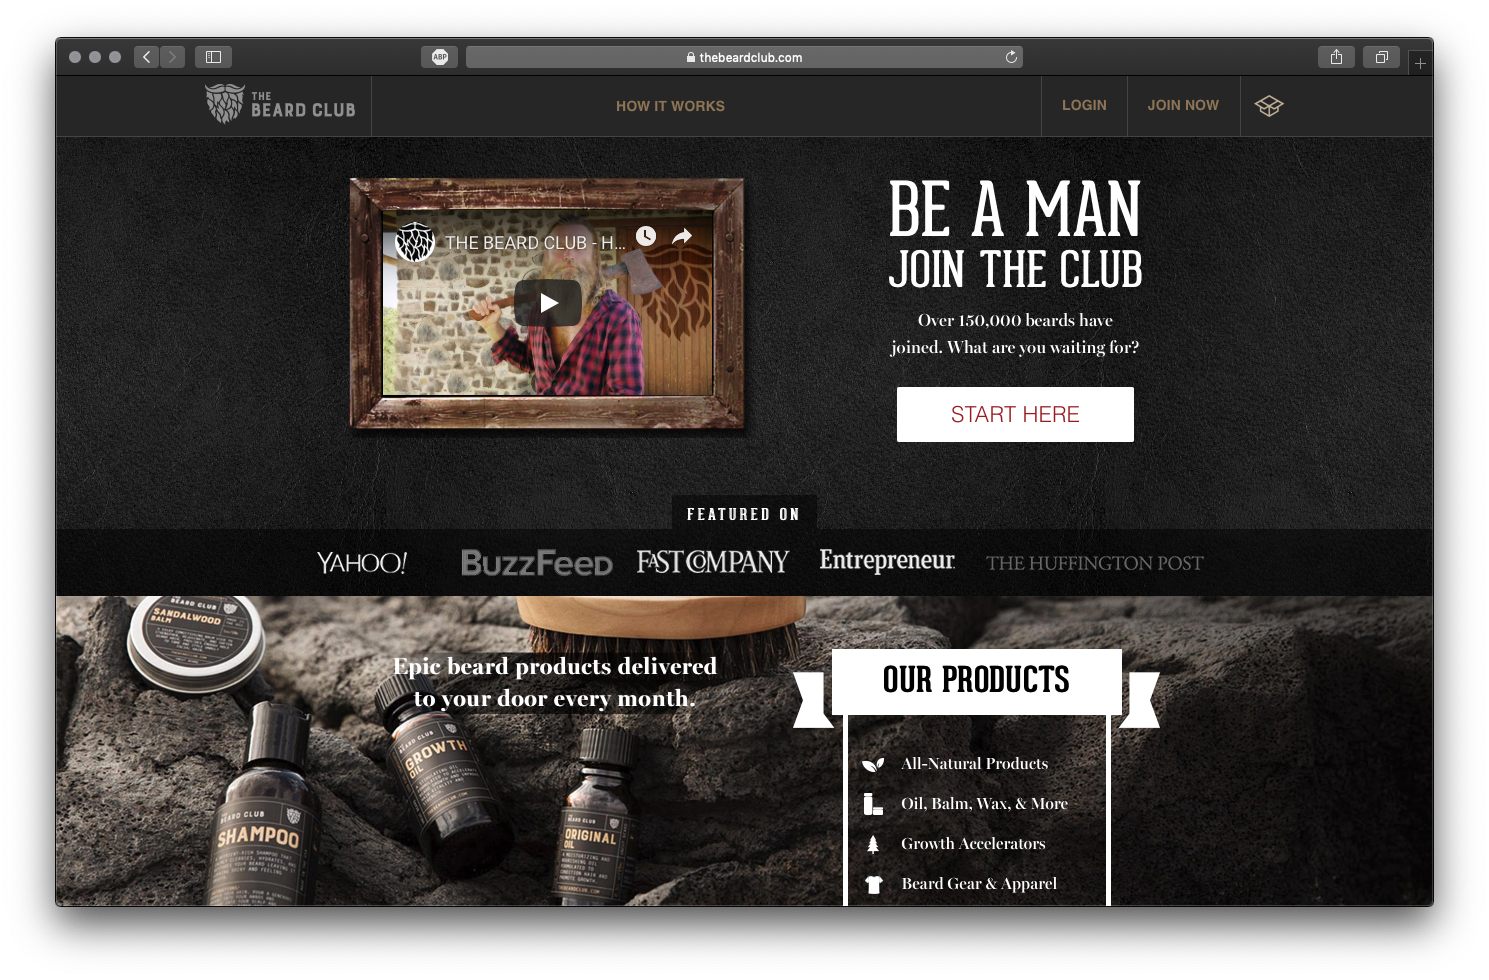 Image de la homepage du Dollar Beard Club